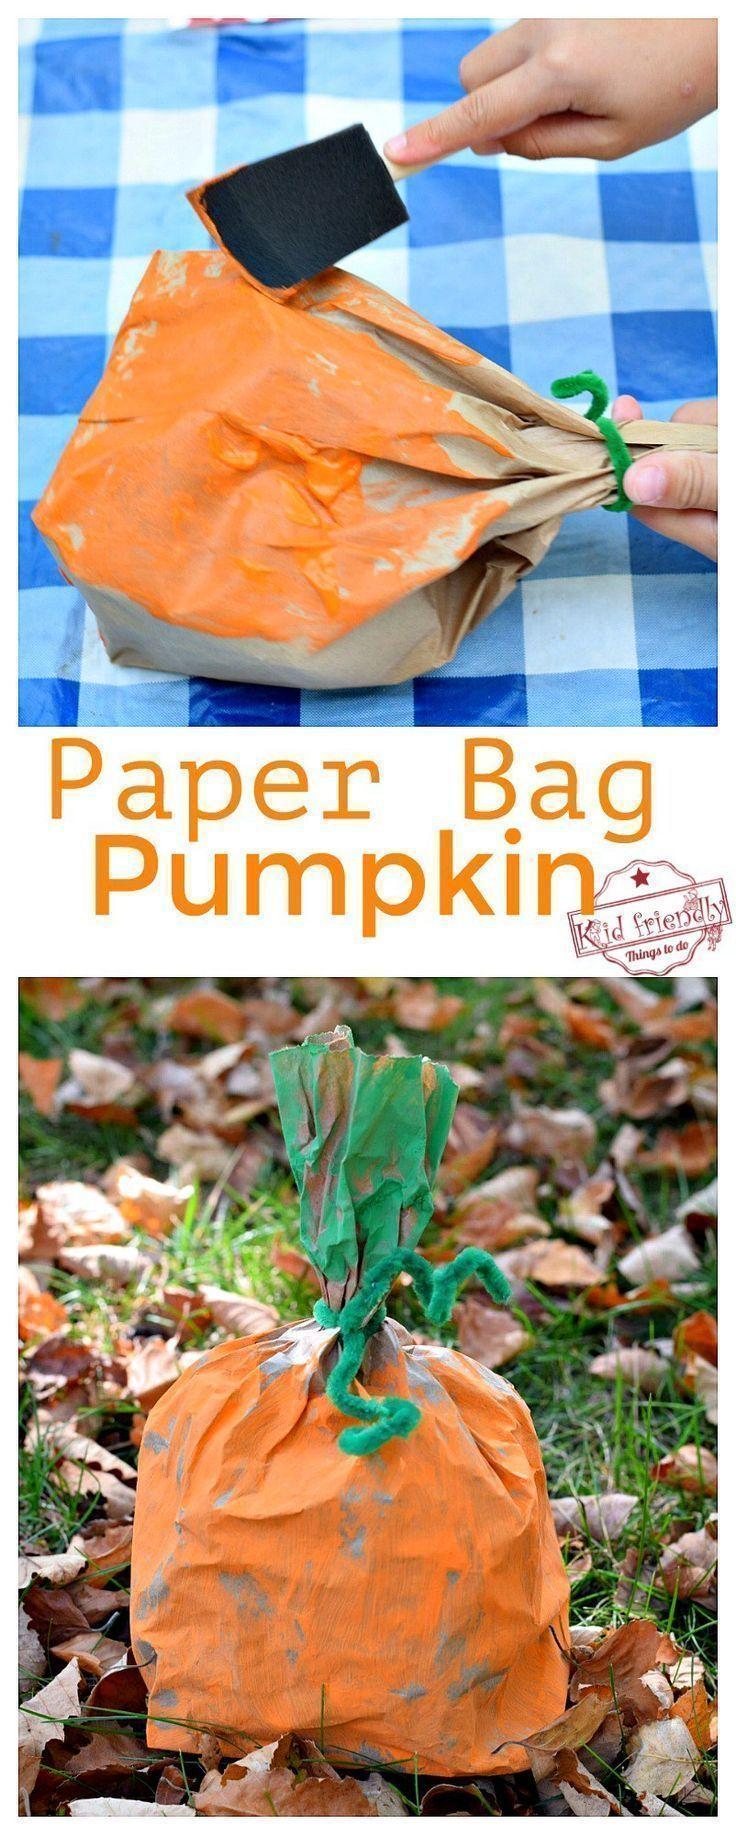 Easy and Fun Paper Bag Pumpkin Craft for Kids to Make #fallcraftsfortoddlers